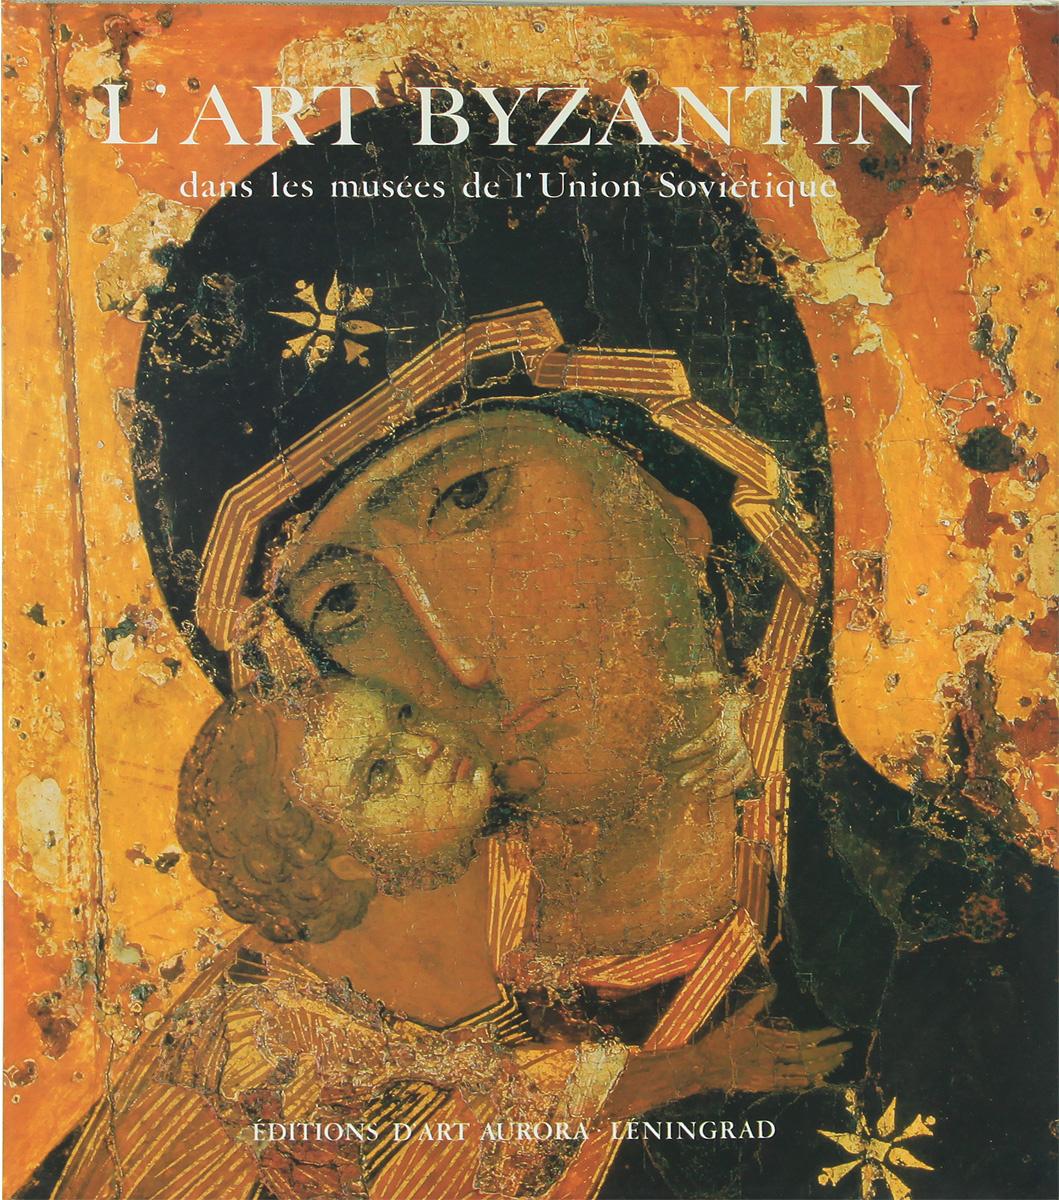 L'Art Byzantin dans les musees de I'Union Sovietique / Византийское искусство в музеях Советского Союза #1